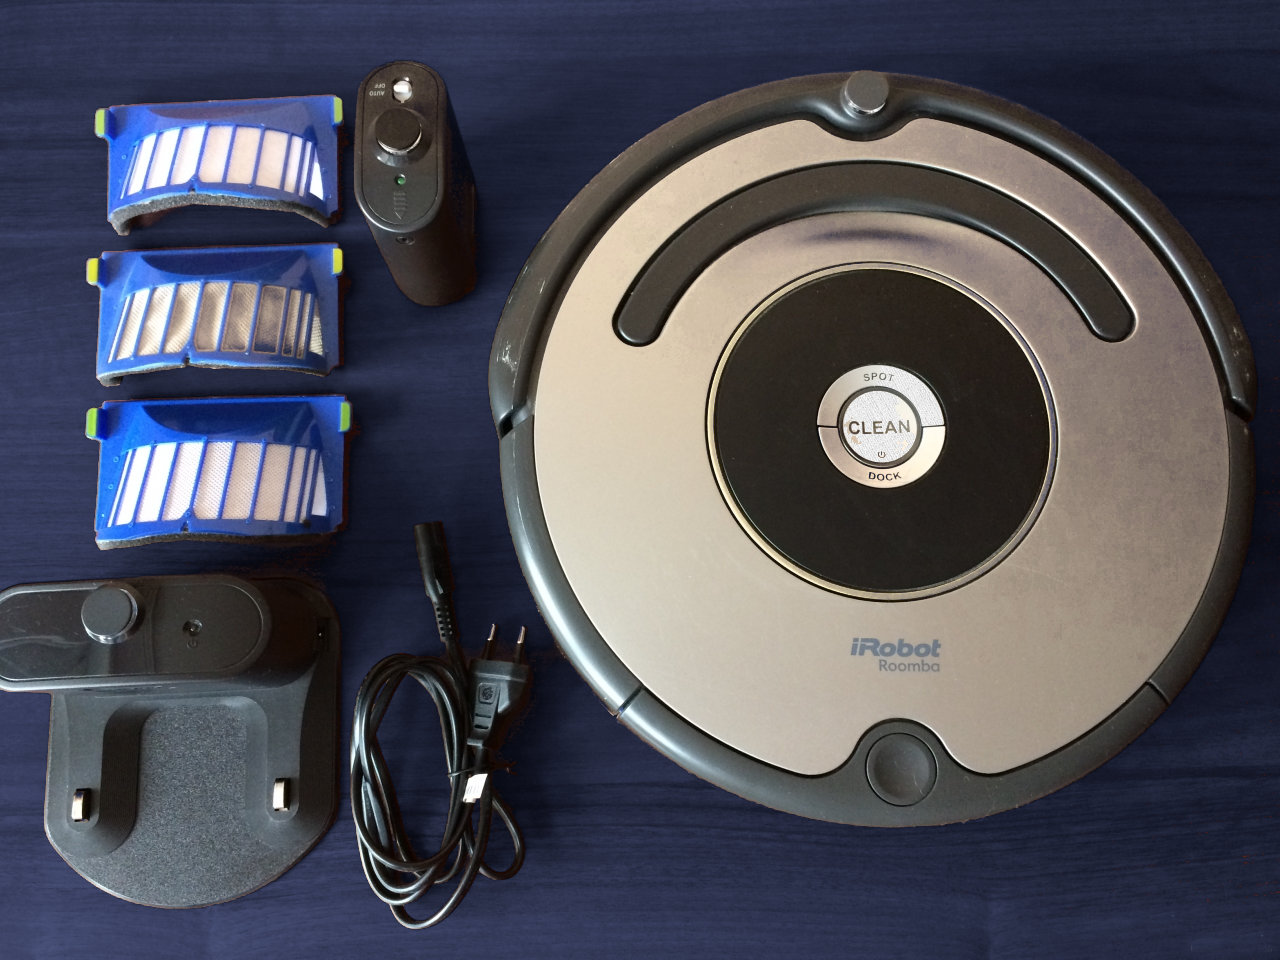 iRobot Roomba 616 - 2018